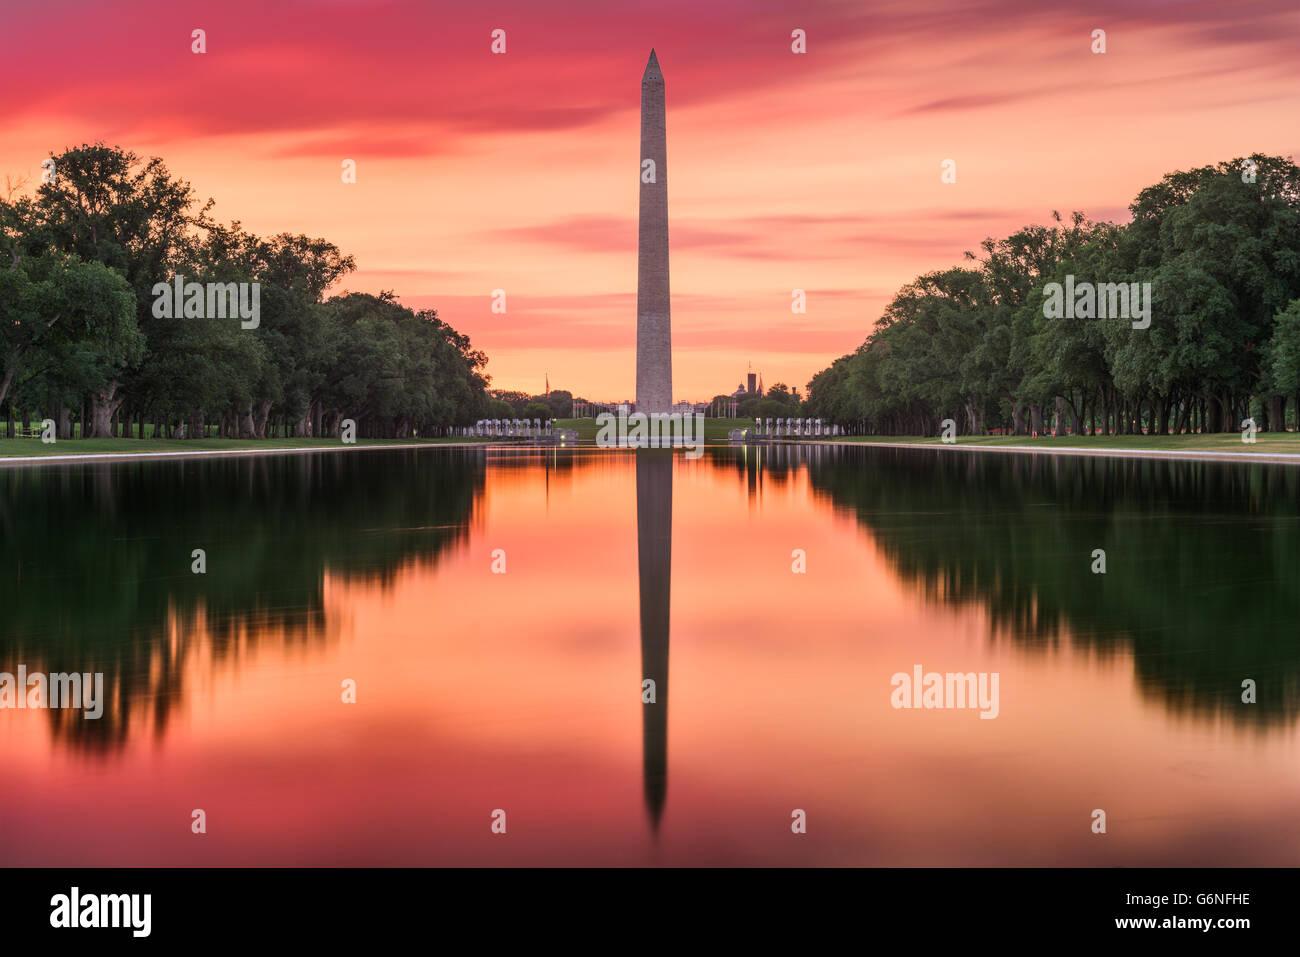 Washington DC am reflektierenden Pool und Washington Monument. Stockbild